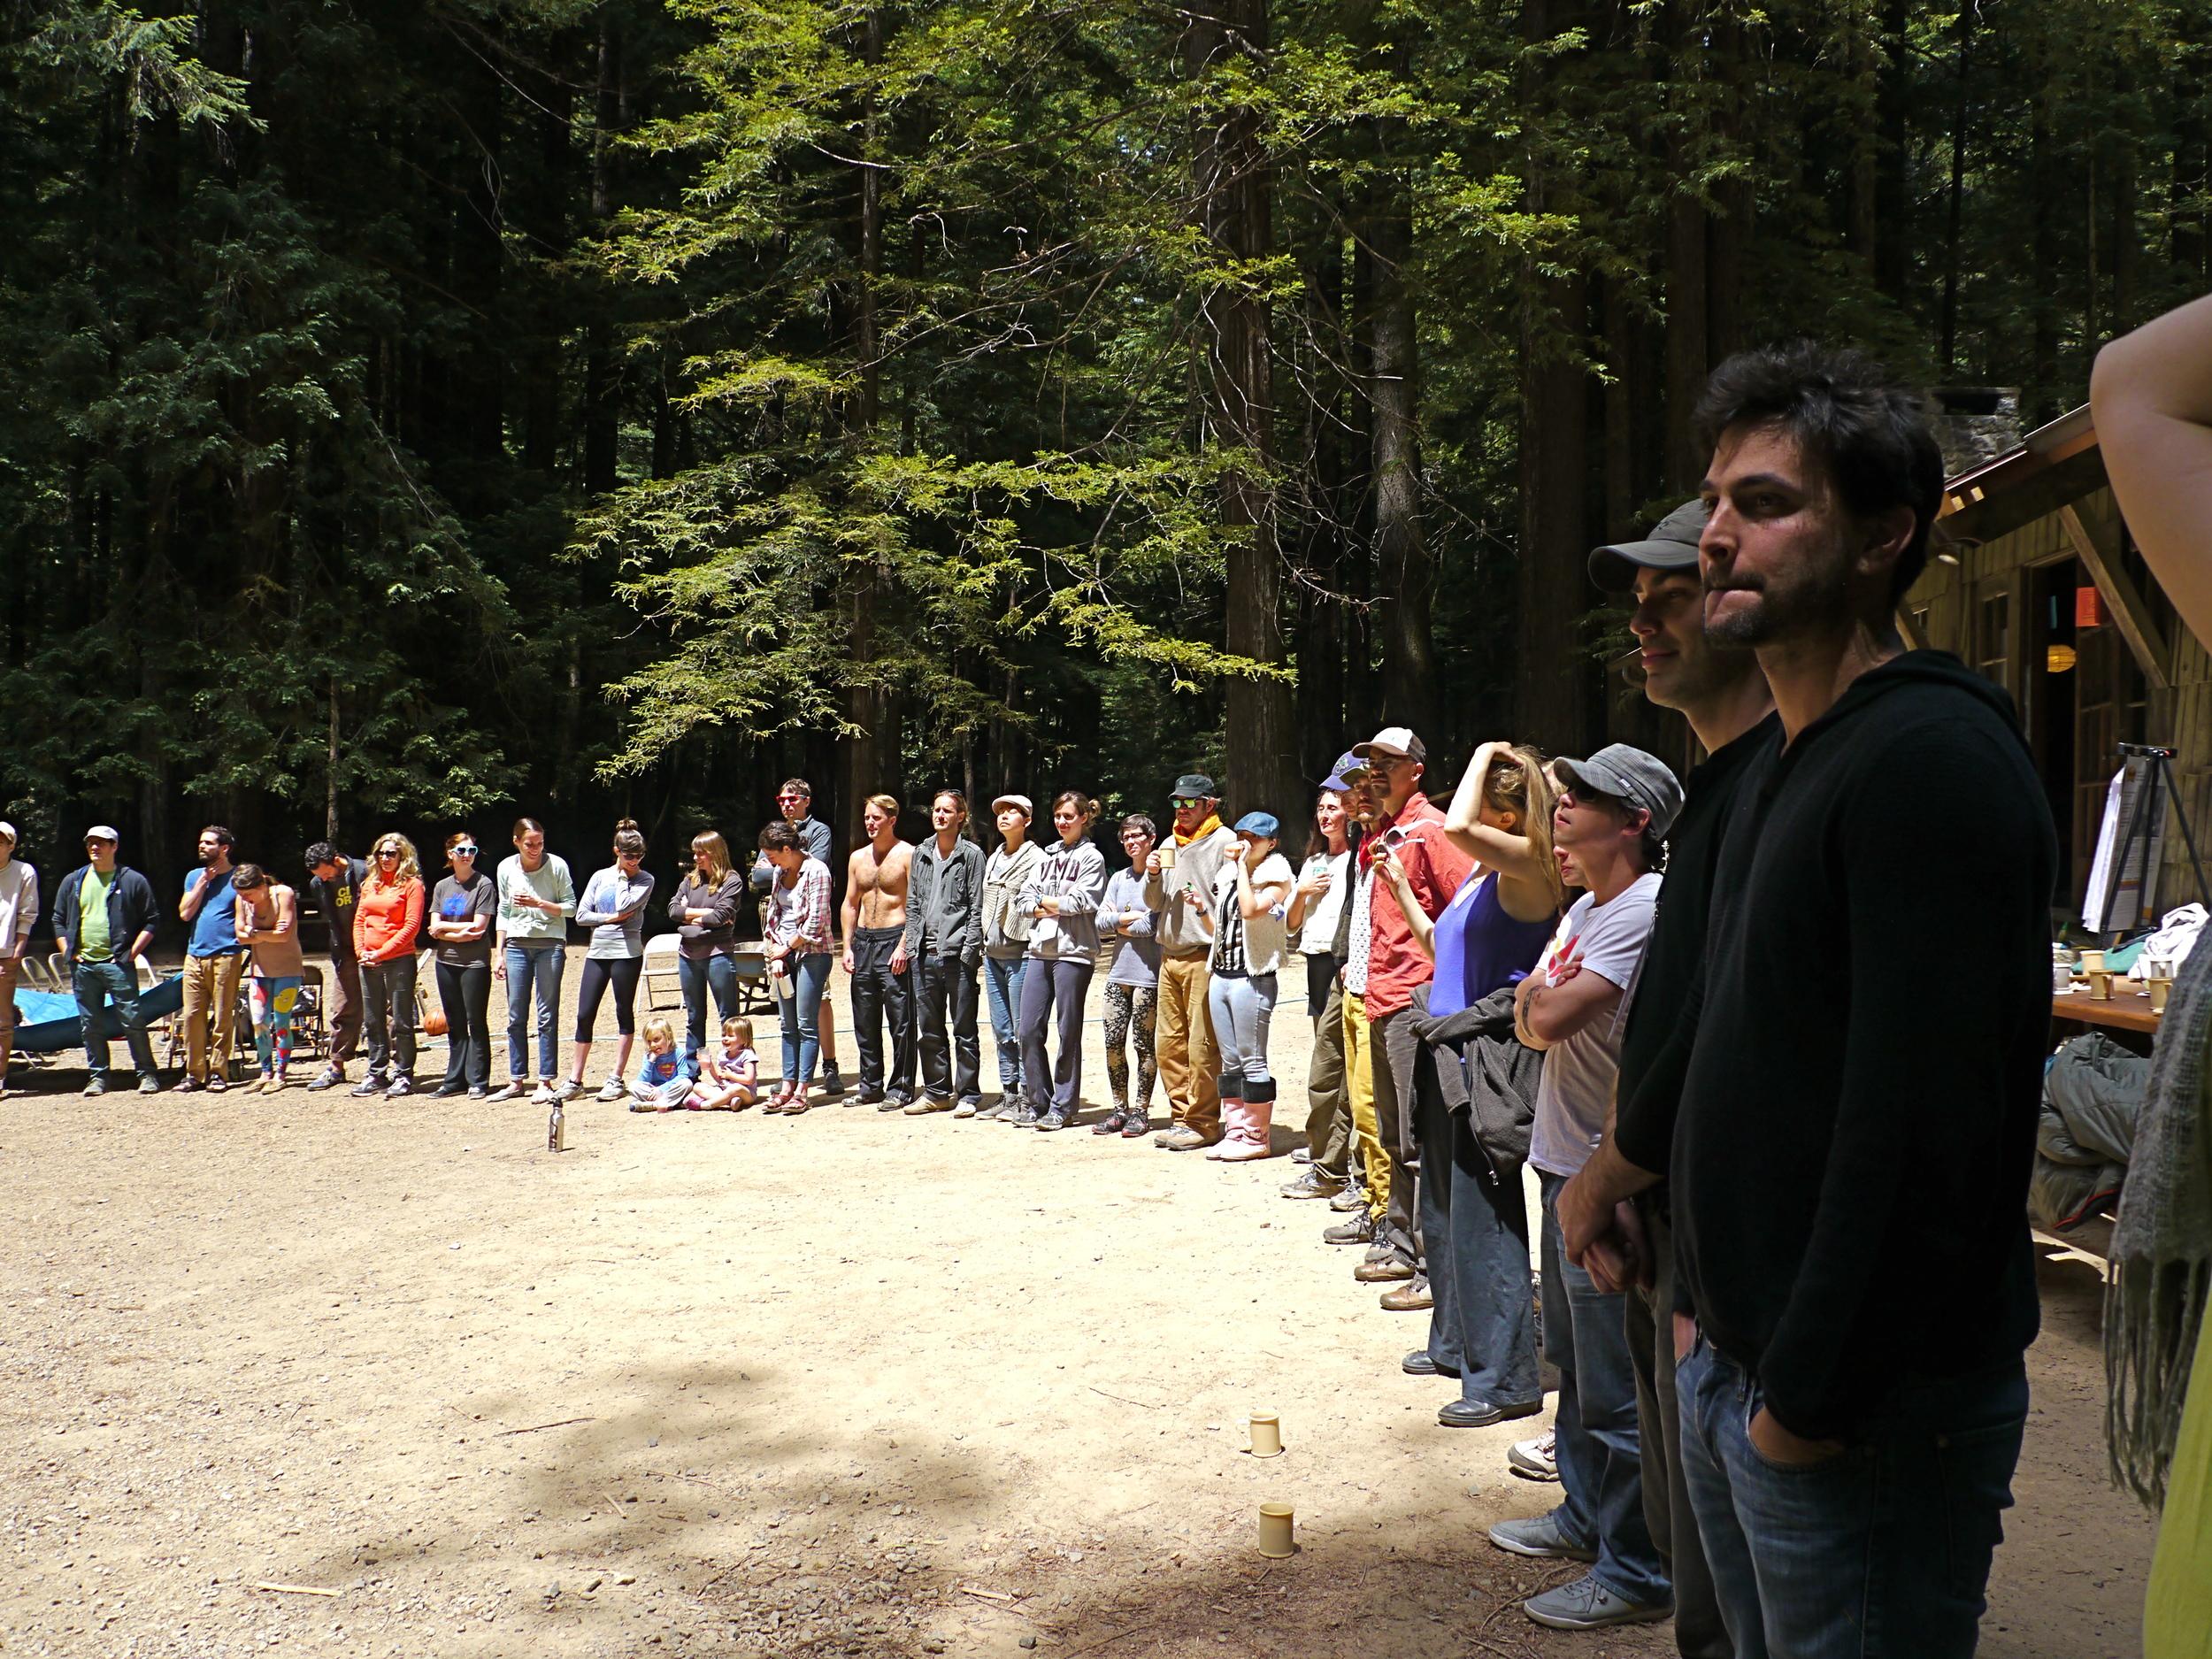 group outdoors.JPG